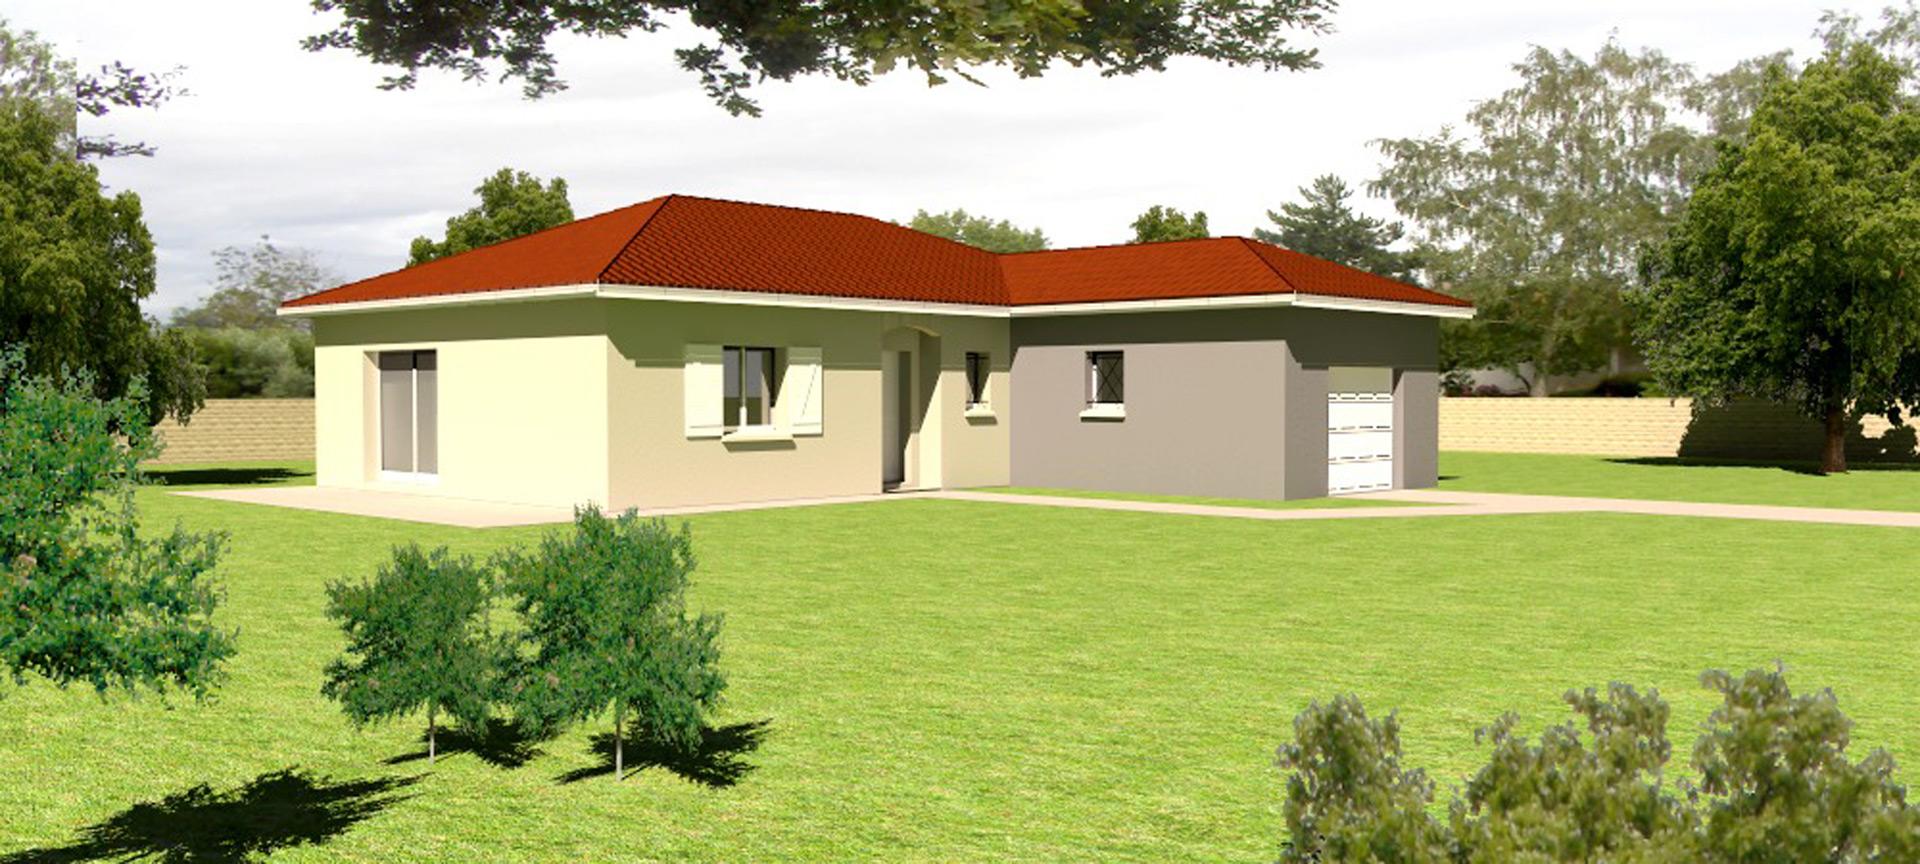 Idee construction maison